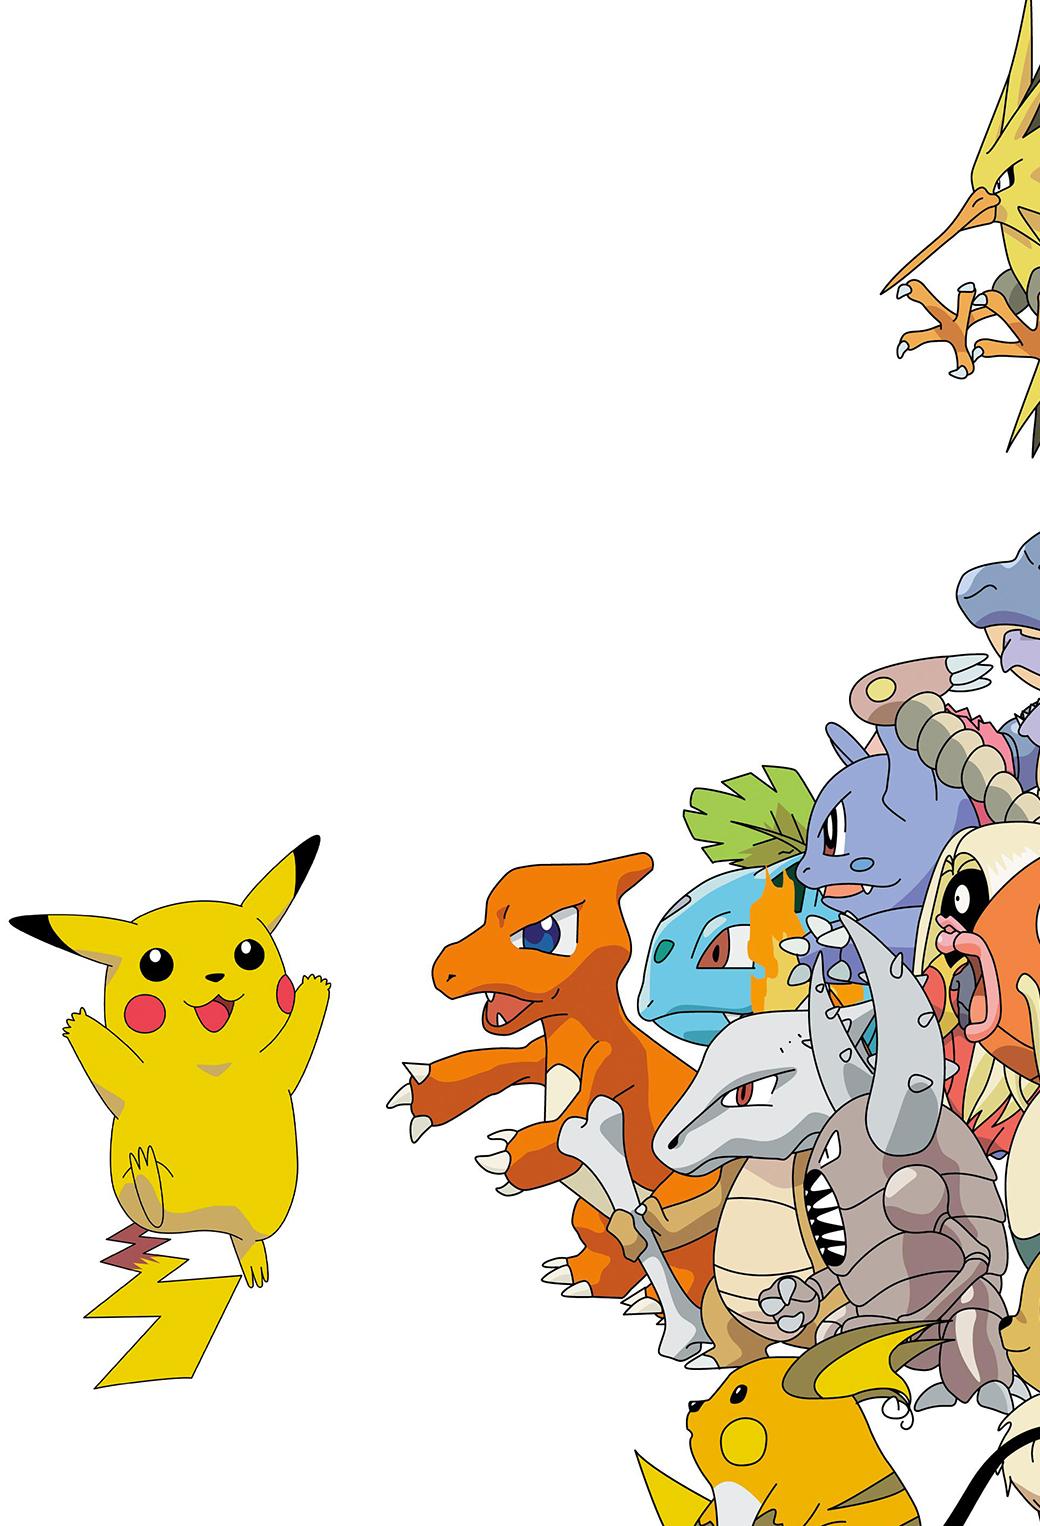 Pokemon Pikachu 3Wallpapers iPhone Parallax Pokemon Pikachu   iPhone Parallax